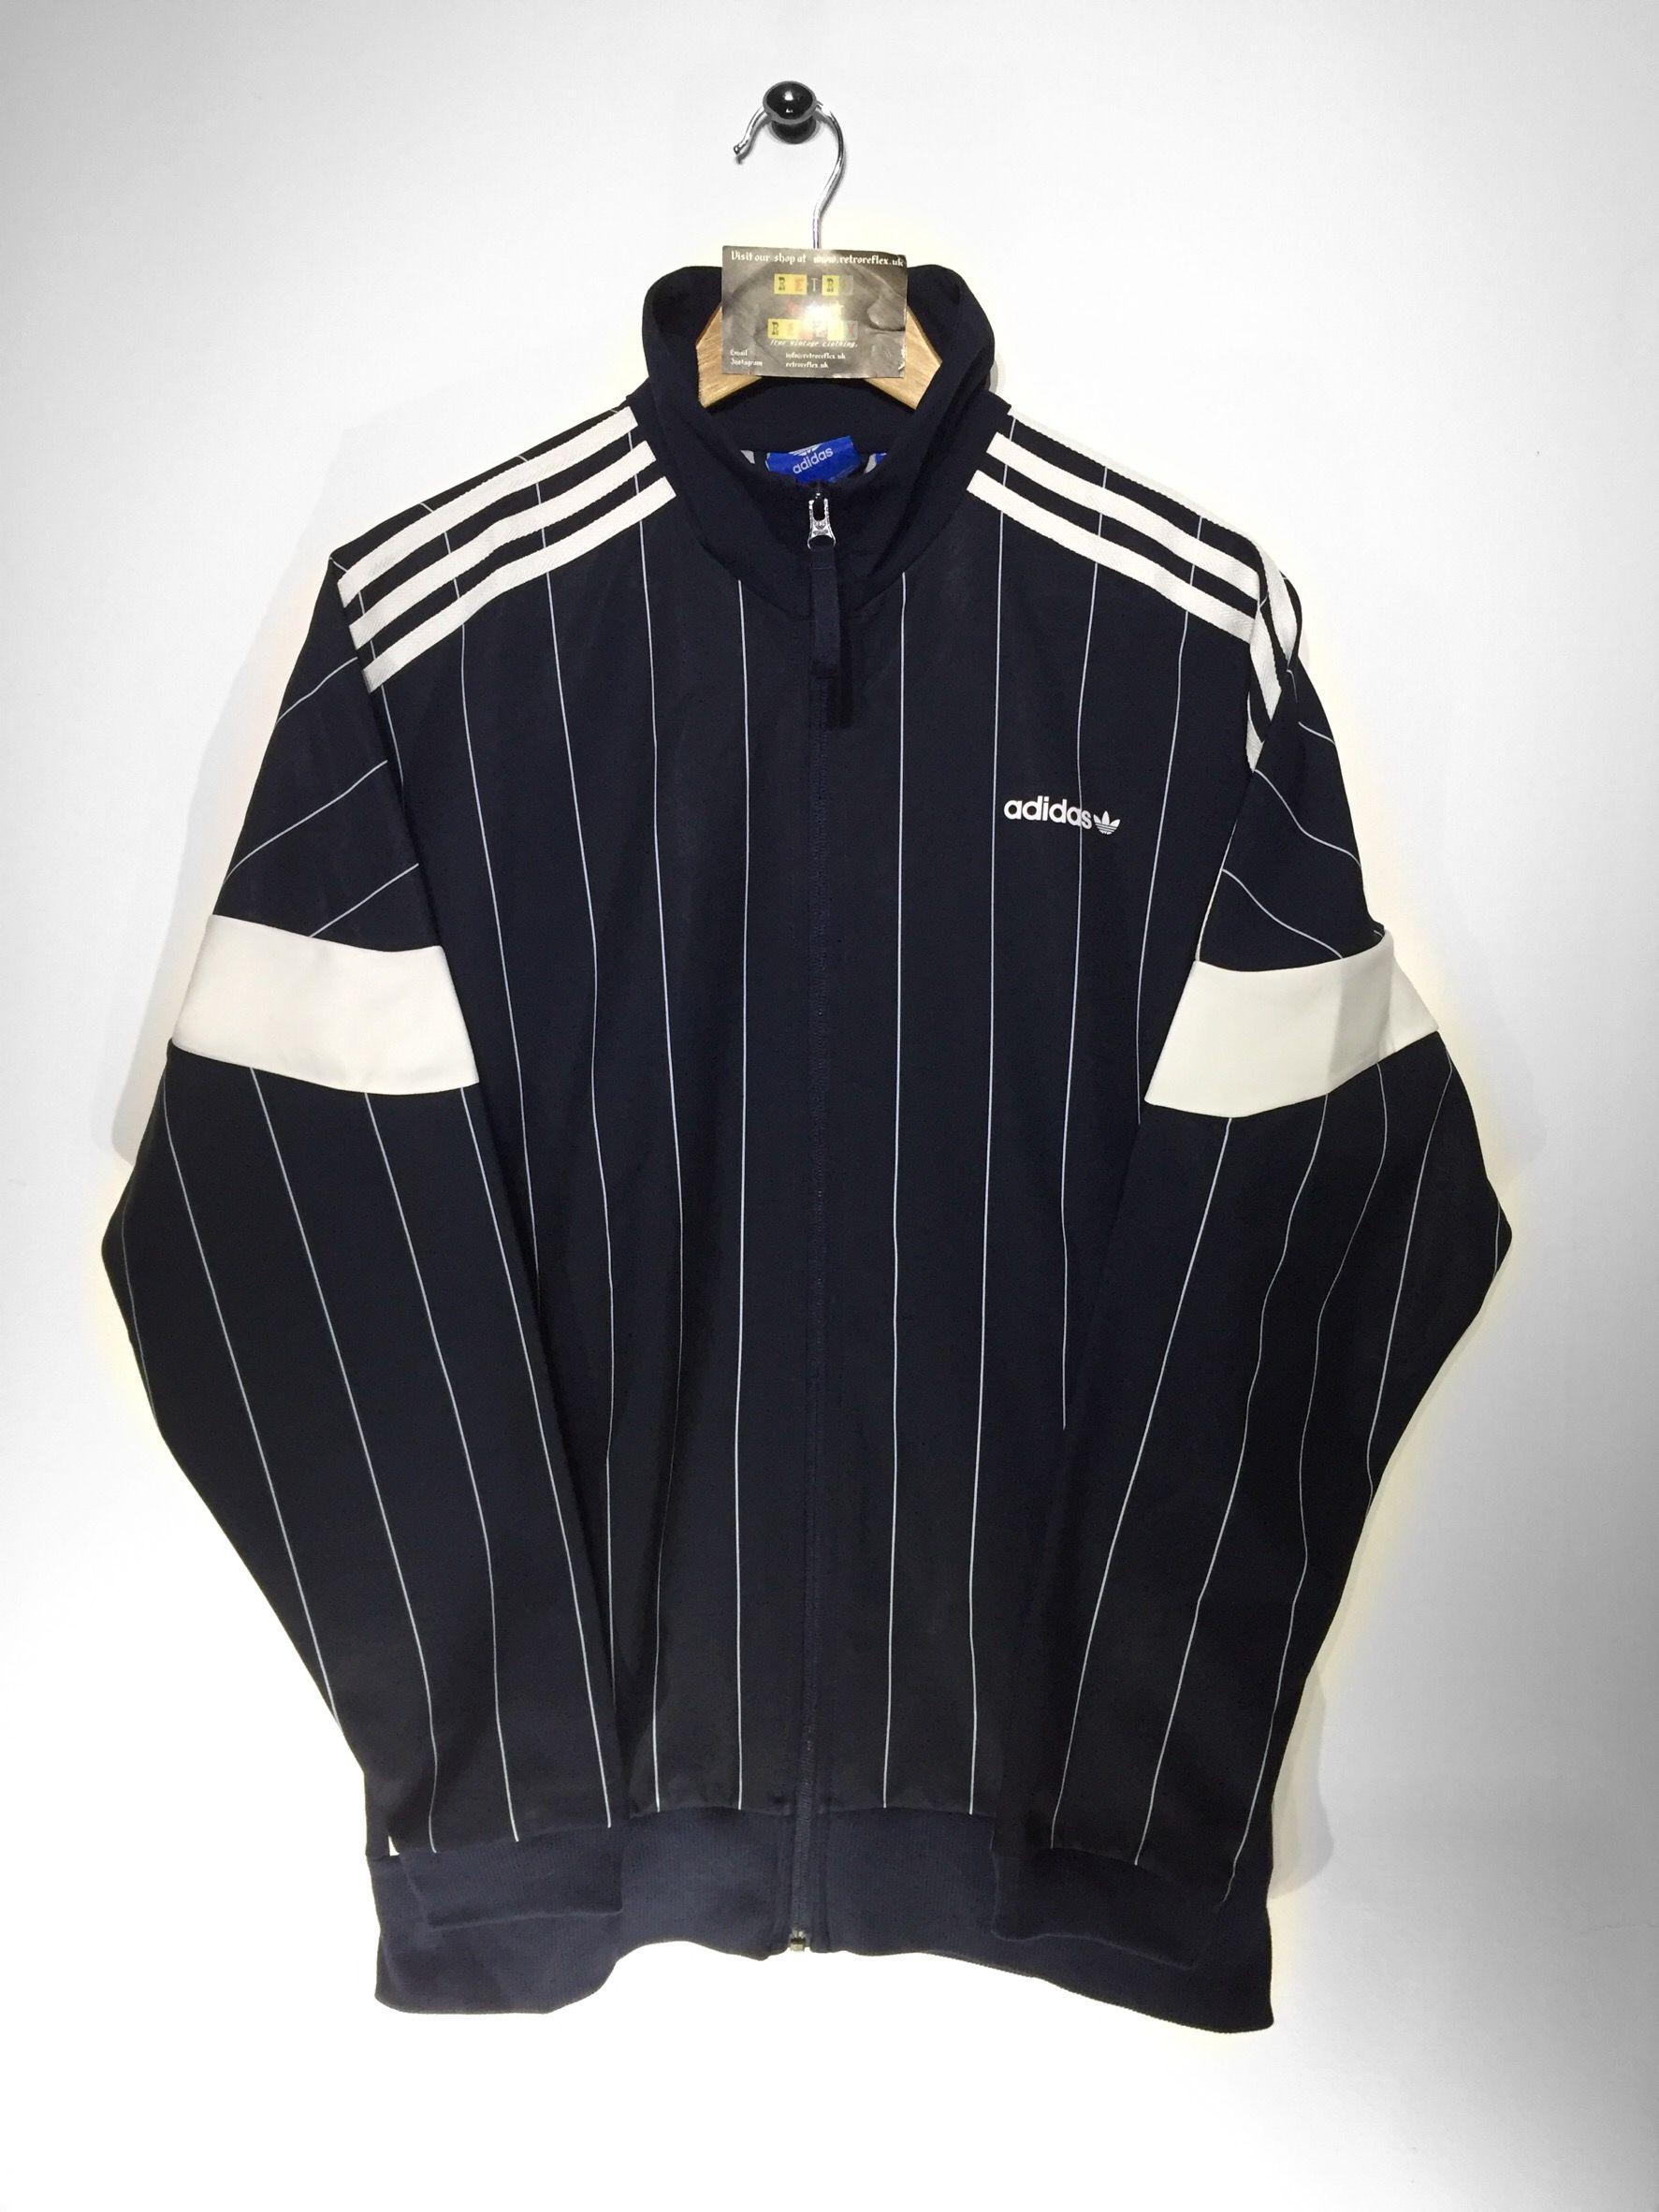 super popular 4fff0 063ea Adidas track jacket size Large(but Fits oversized) £32 Website➡ www